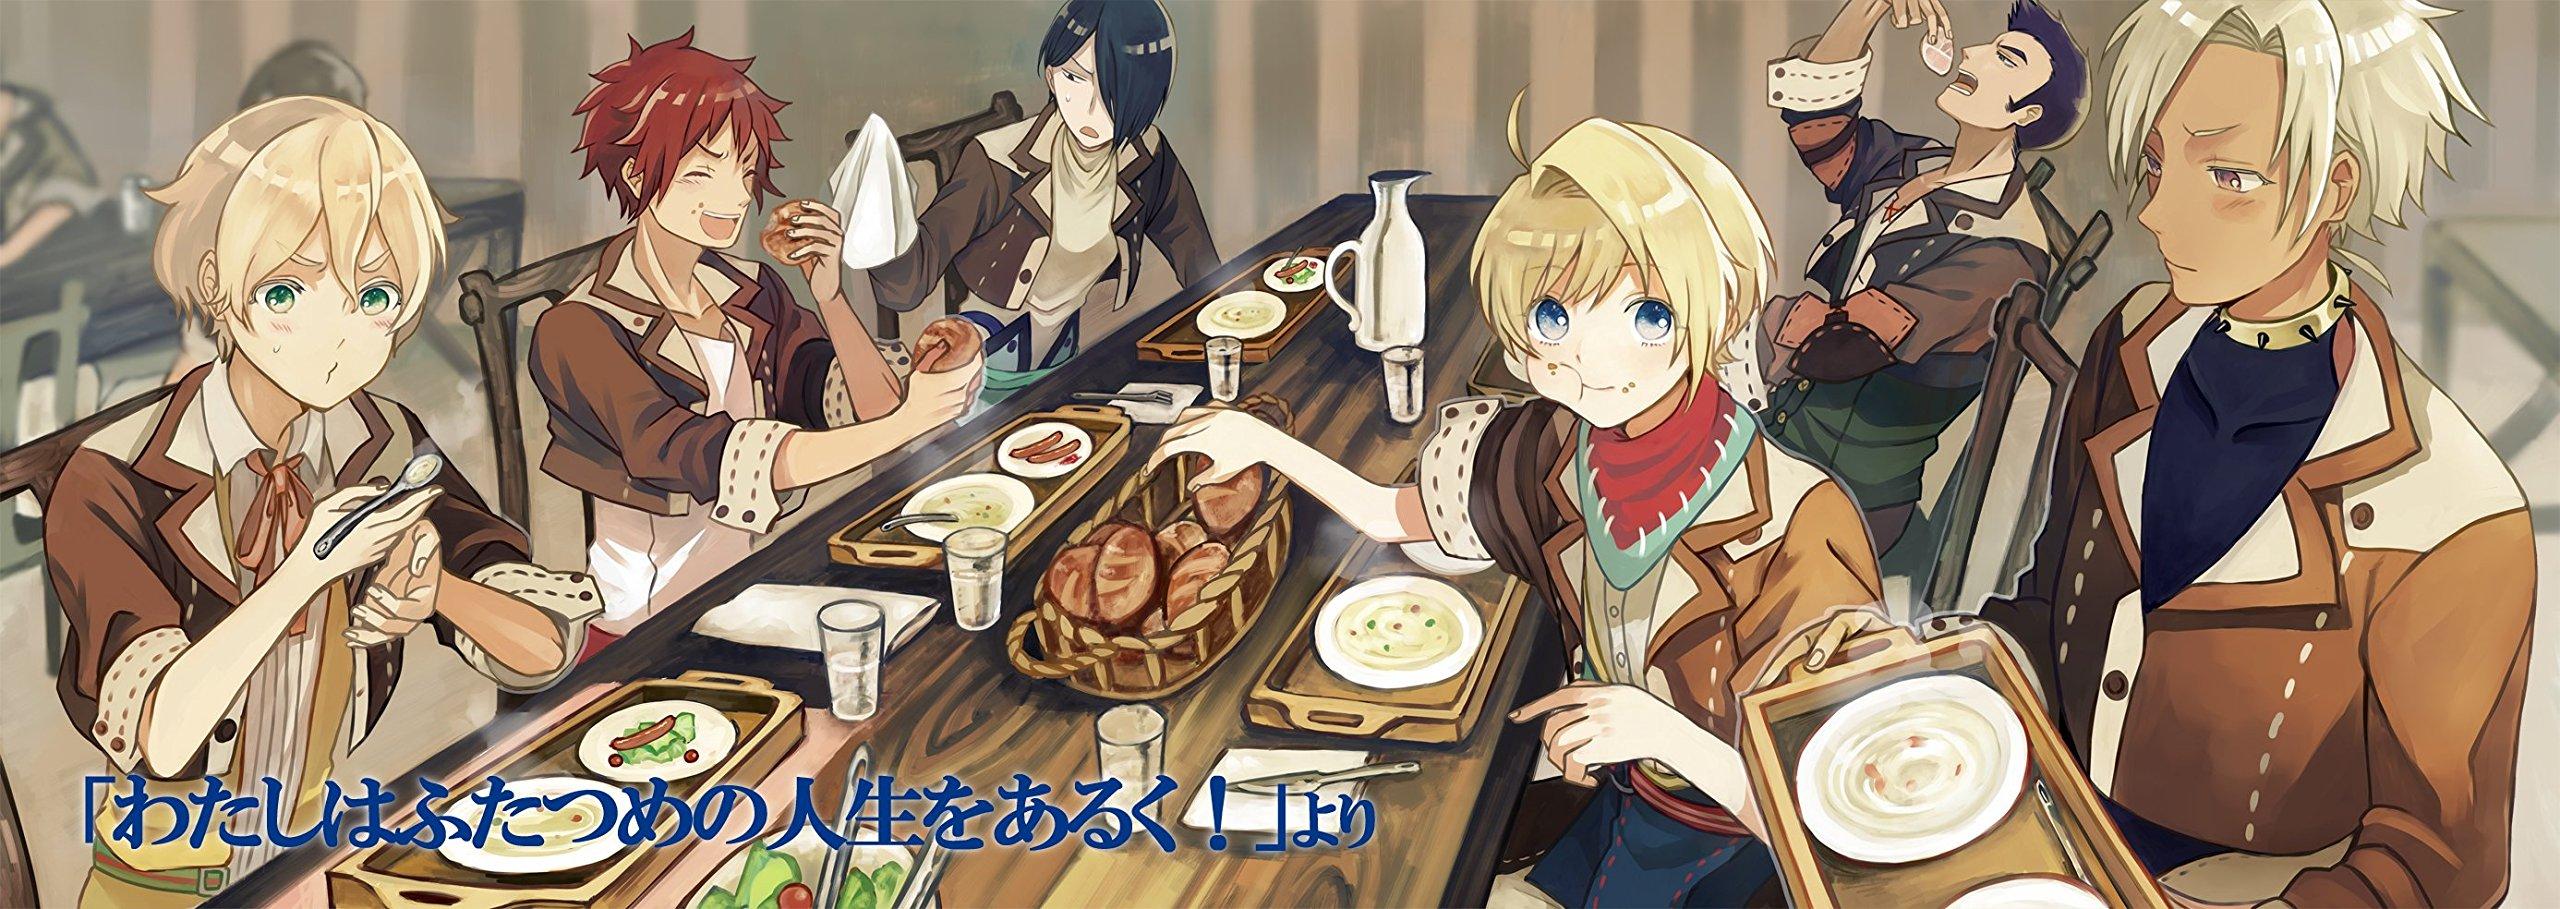 Everyone eating dinner.